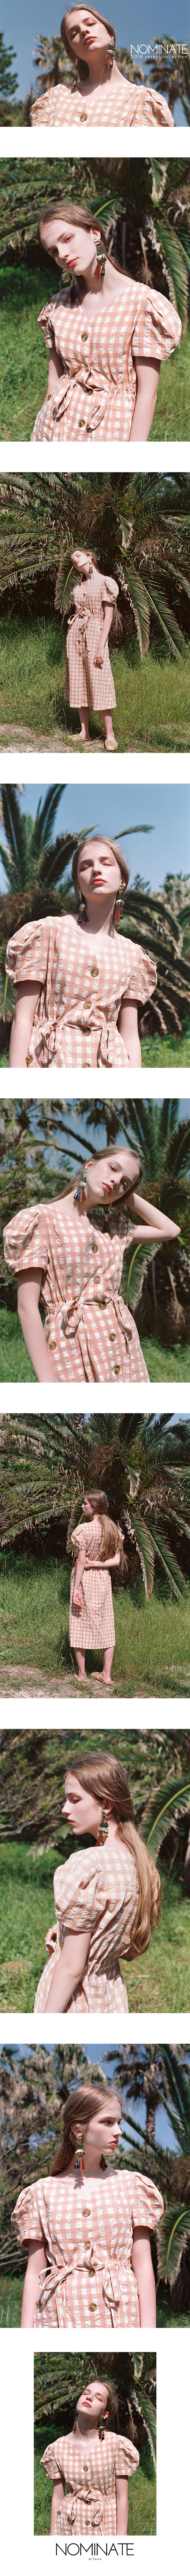 NOMINATE - Korean Fashion - #Kfashion - Gingham Check Dress Beige